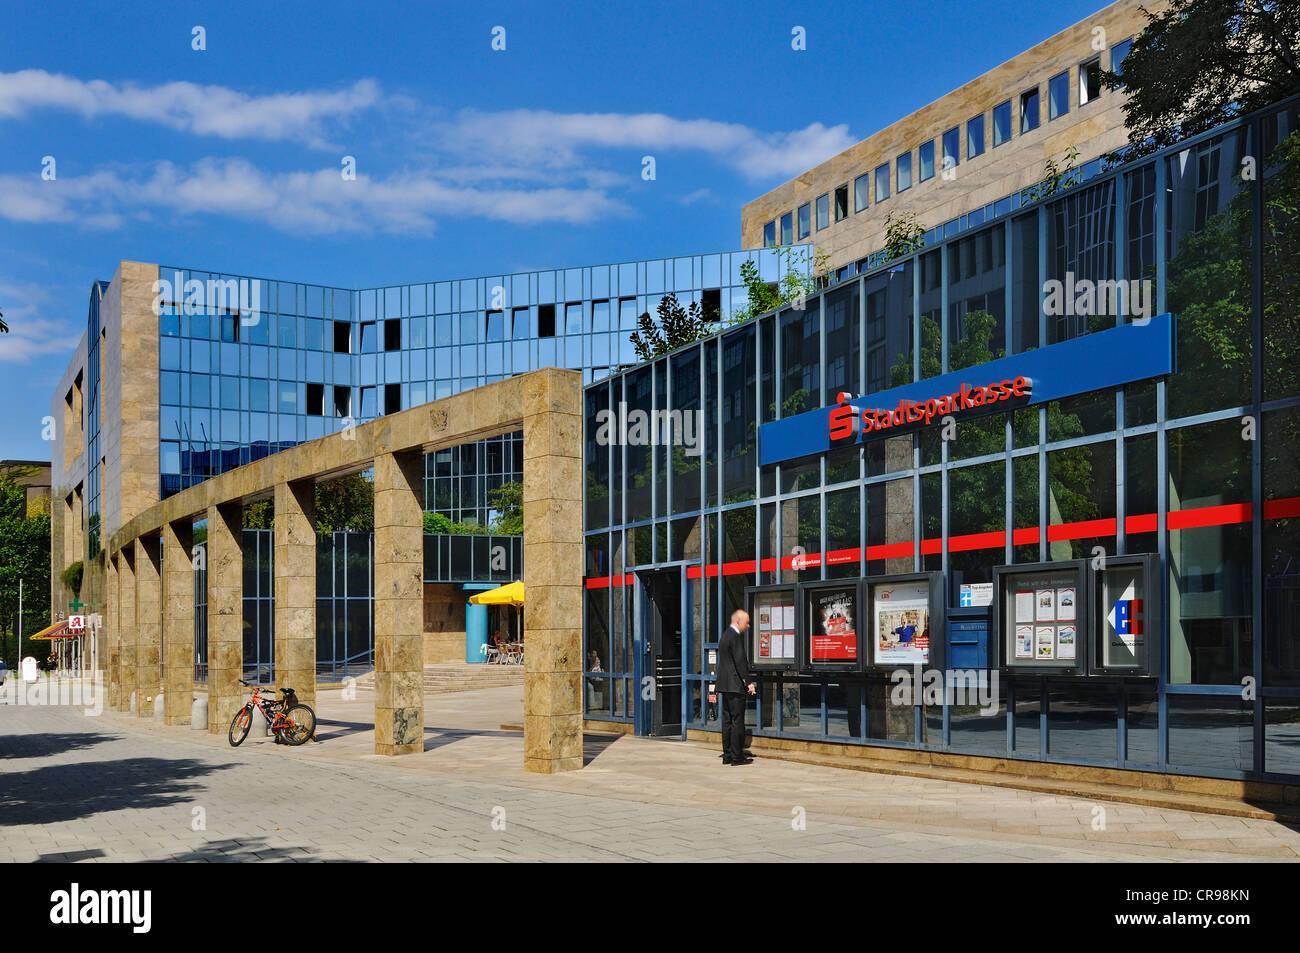 Stadtsparkasse Muenchen bank, administration centre, Ungererstrasse street 75, Munich, Bavaria, Germany, Europe, - Stock Image